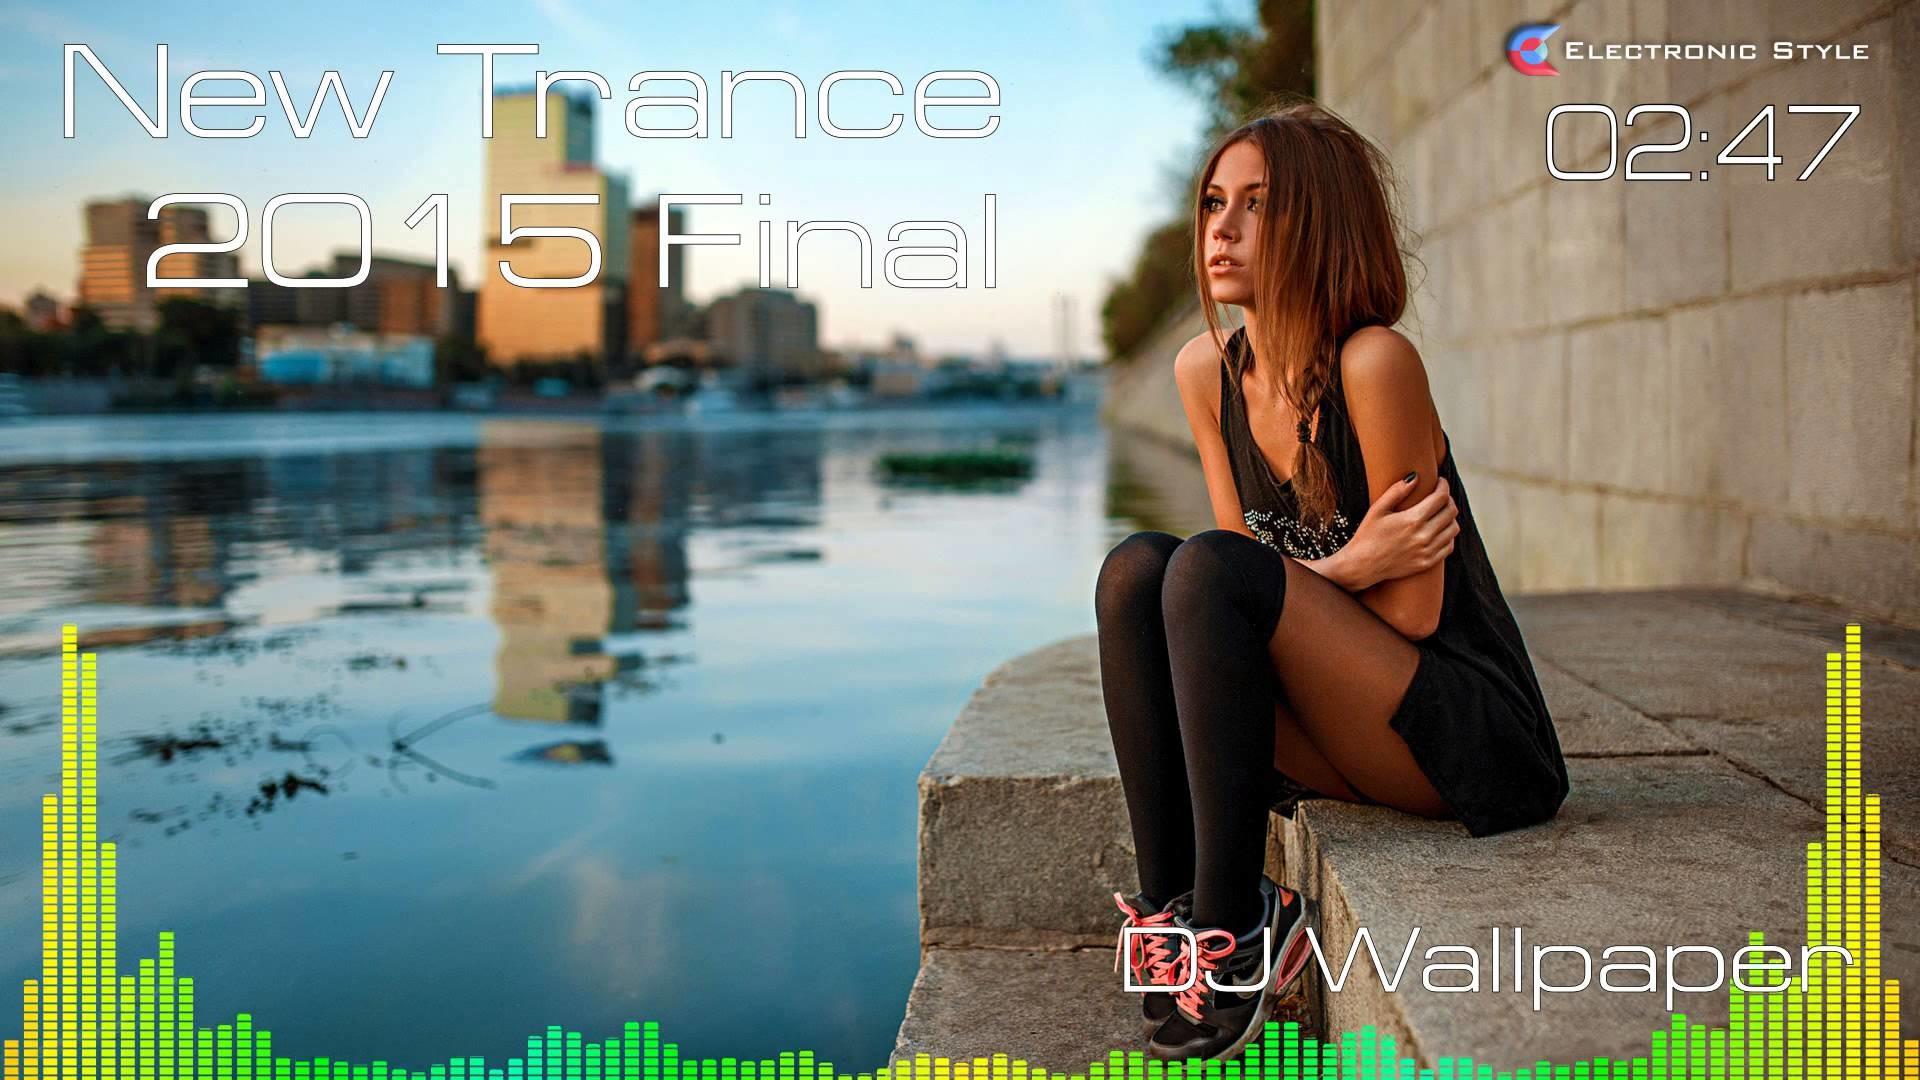 DJ Wallpaper – New Trance 2015 Final [Electronic Style]